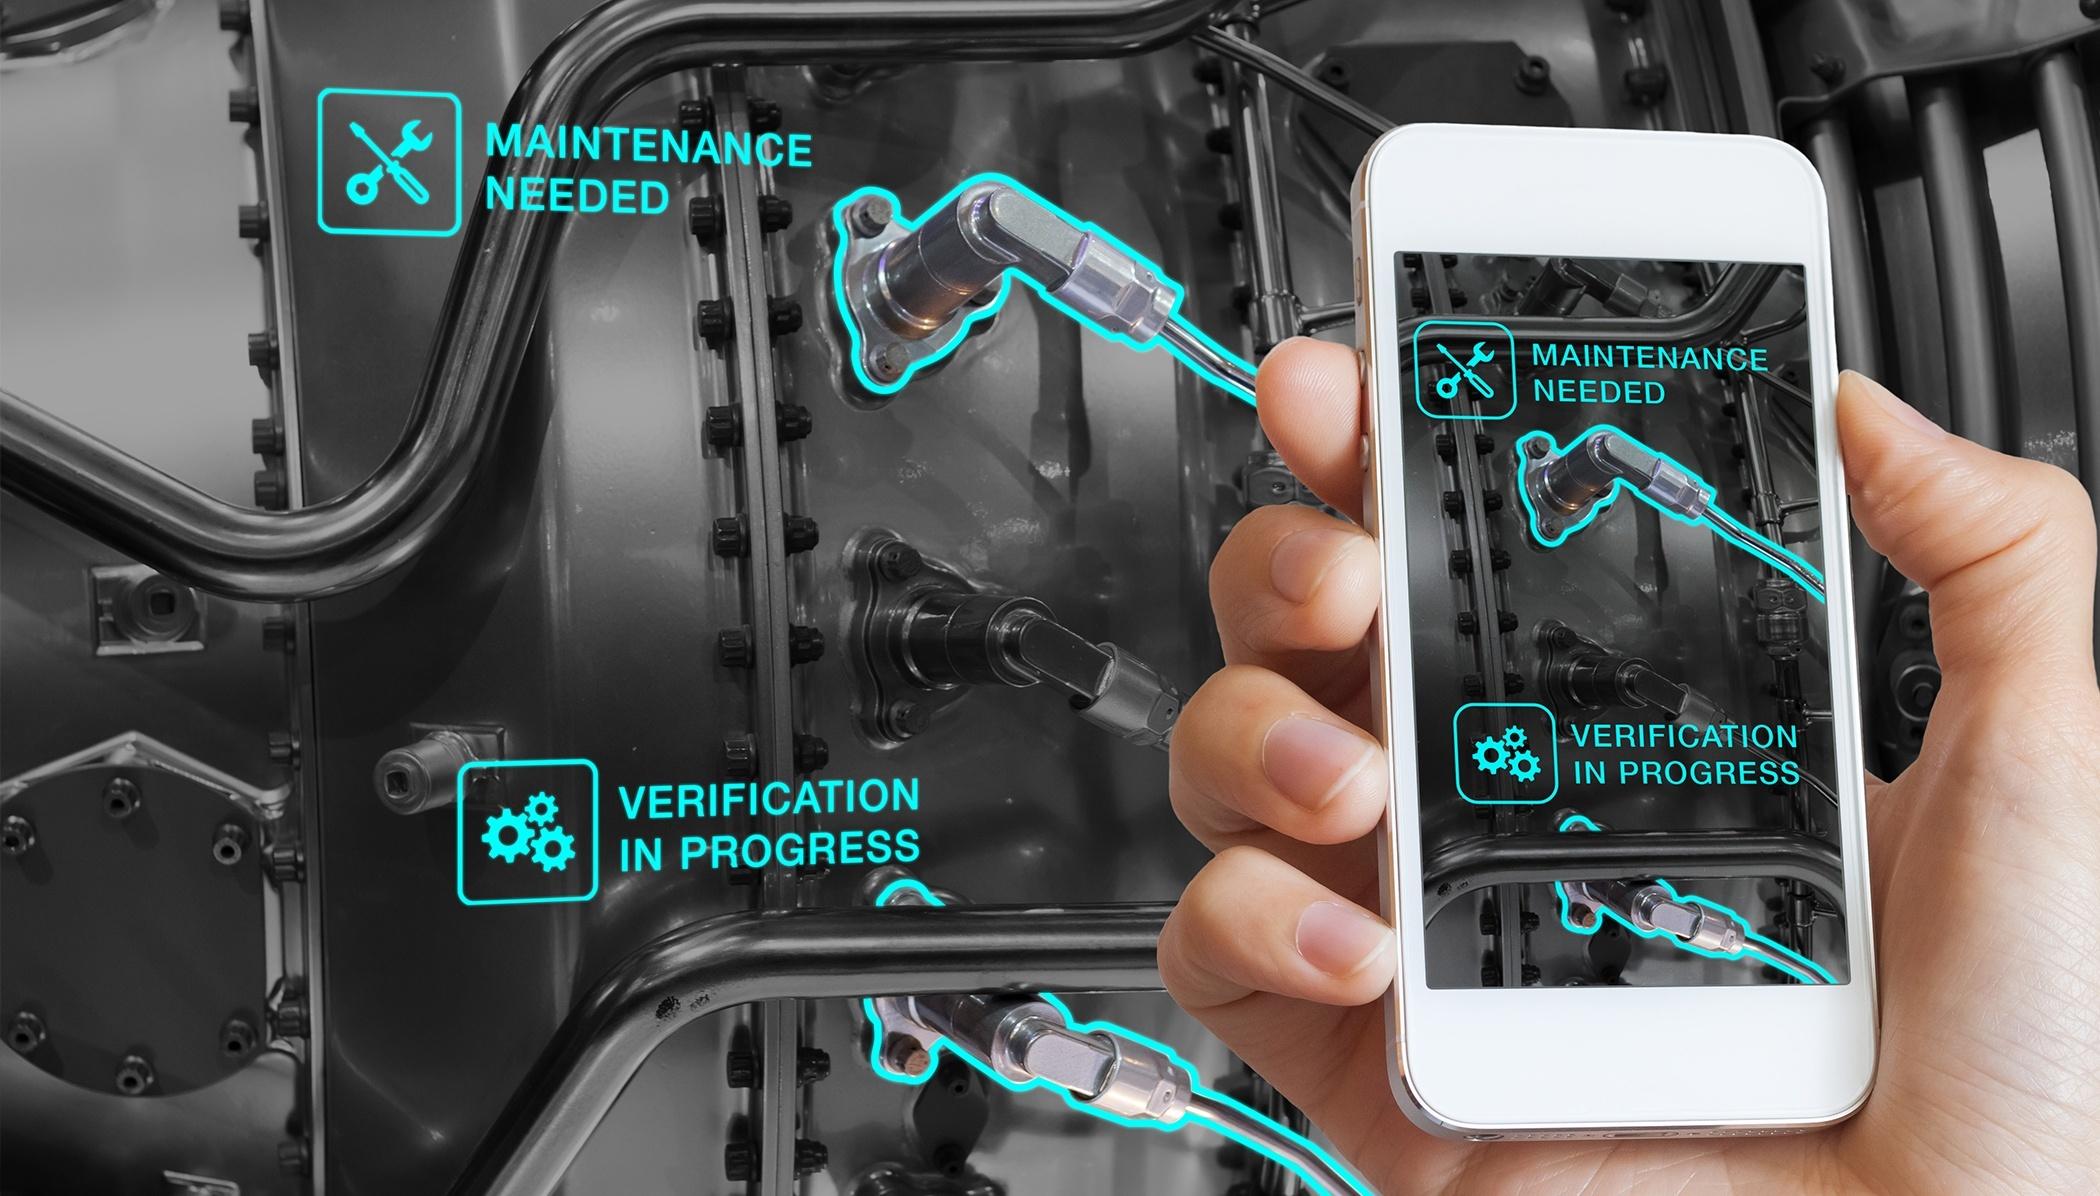 Augmented Reality technology maintenance, technician using smartphone, AR interface, monitoring _Blog